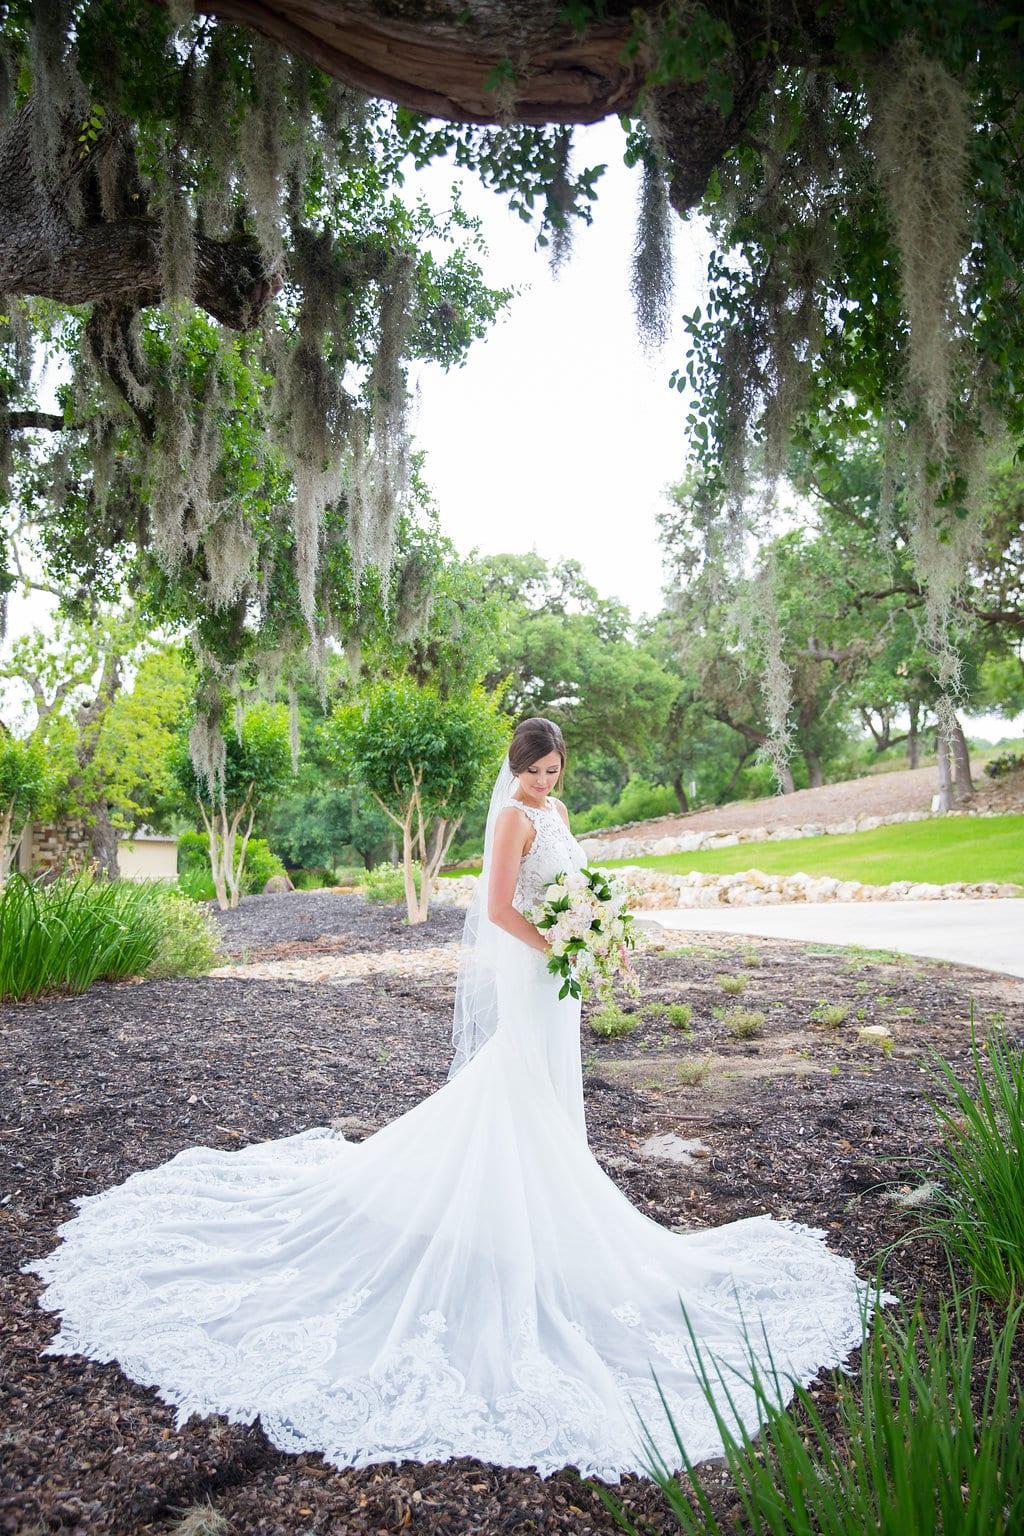 Samantha's Bridal Hidden Falls mossy tree